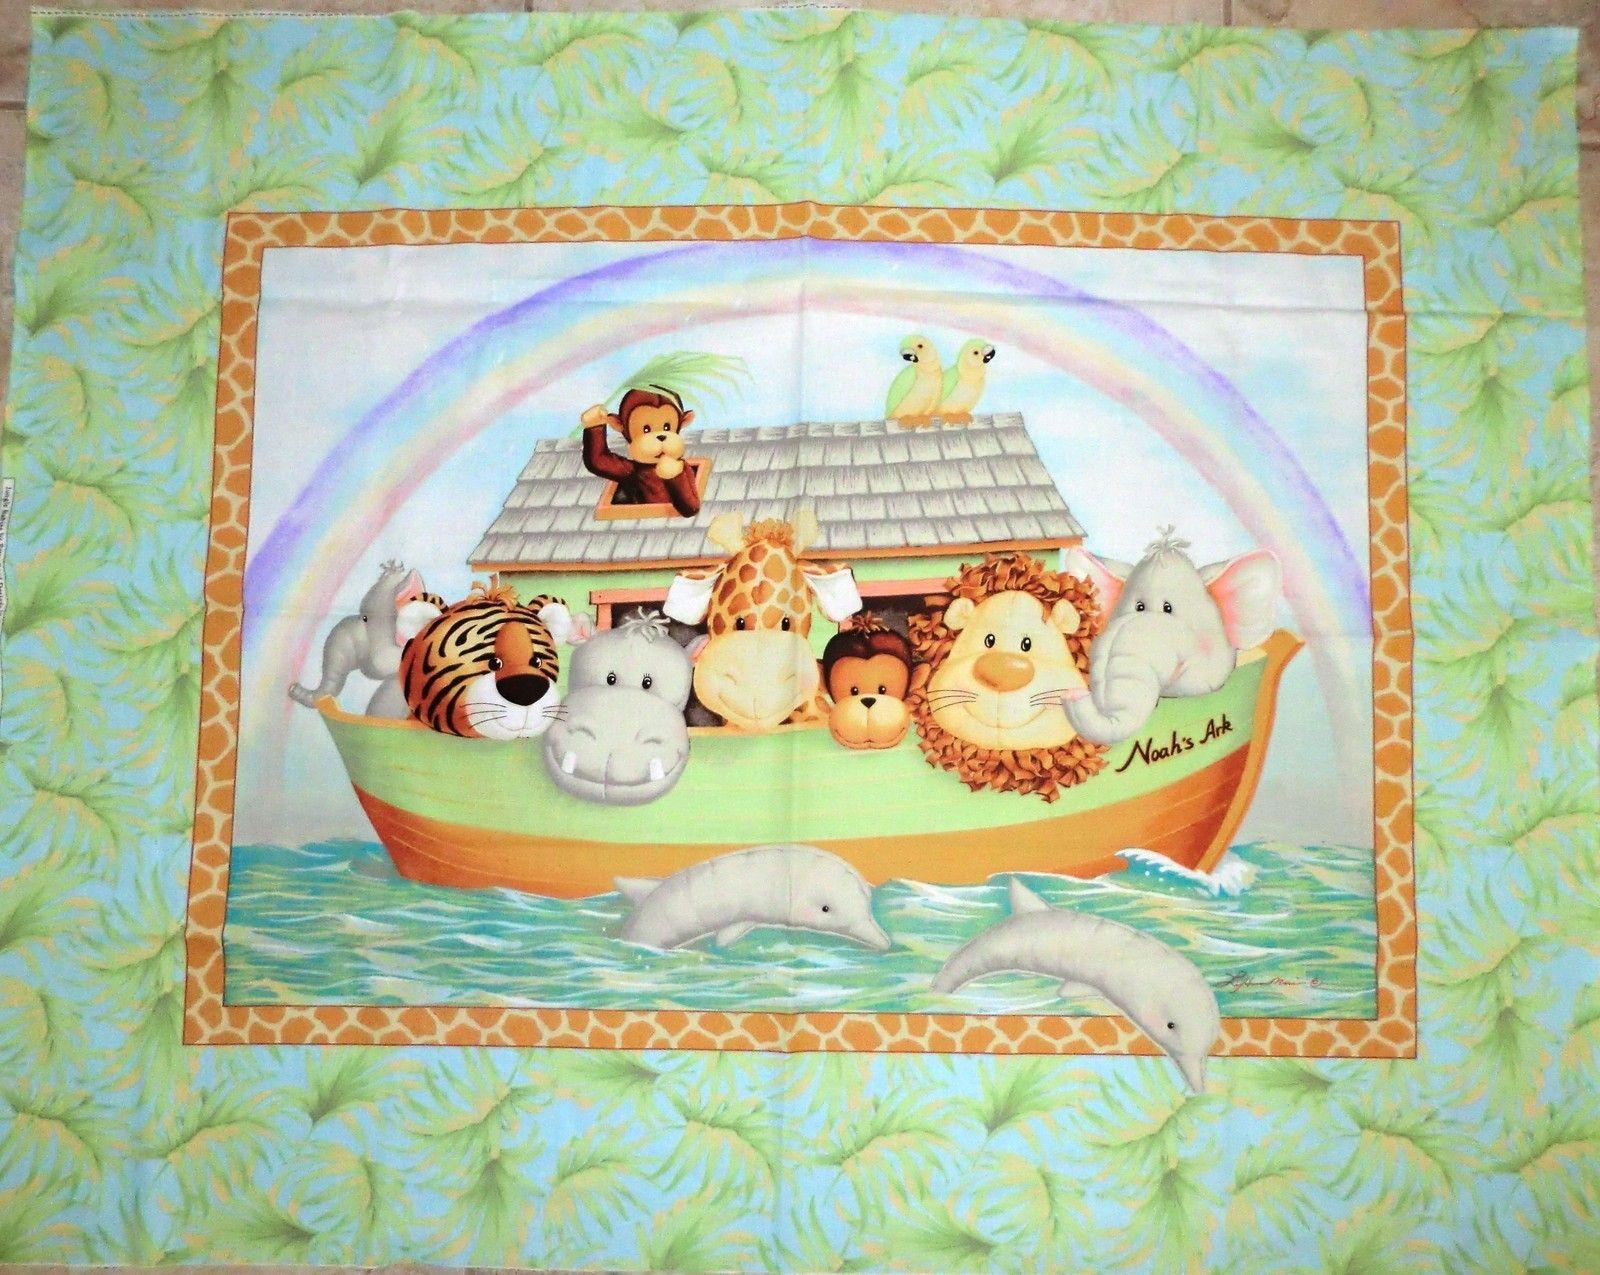 920a2166b65bd Jungle Babies Quilt Panel | Jungle Babies Fabric Panel Quilt Top ...